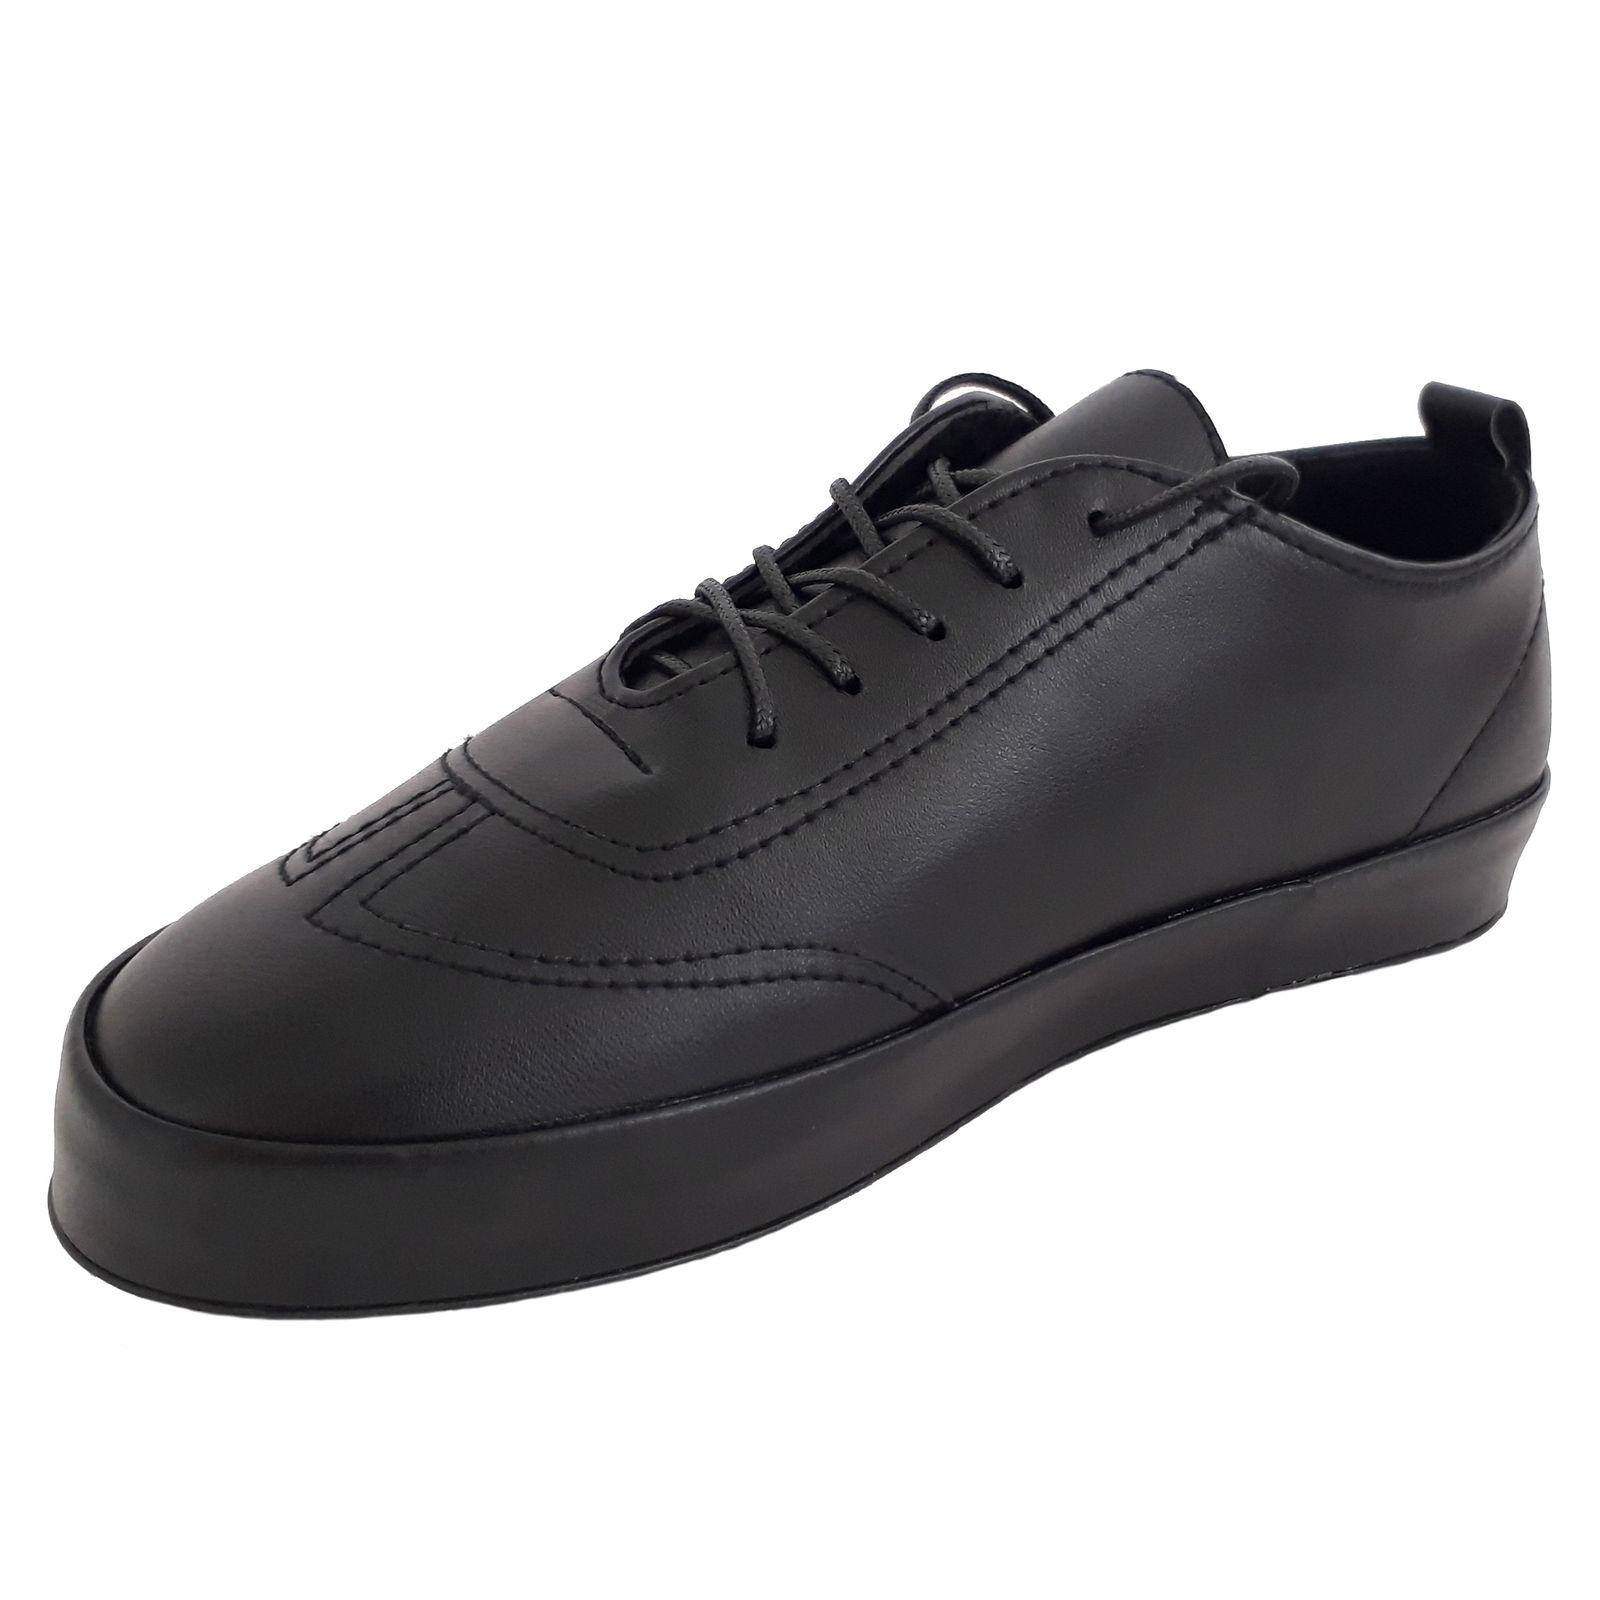 کفش روزمره زنانه کد 1 -  - 5